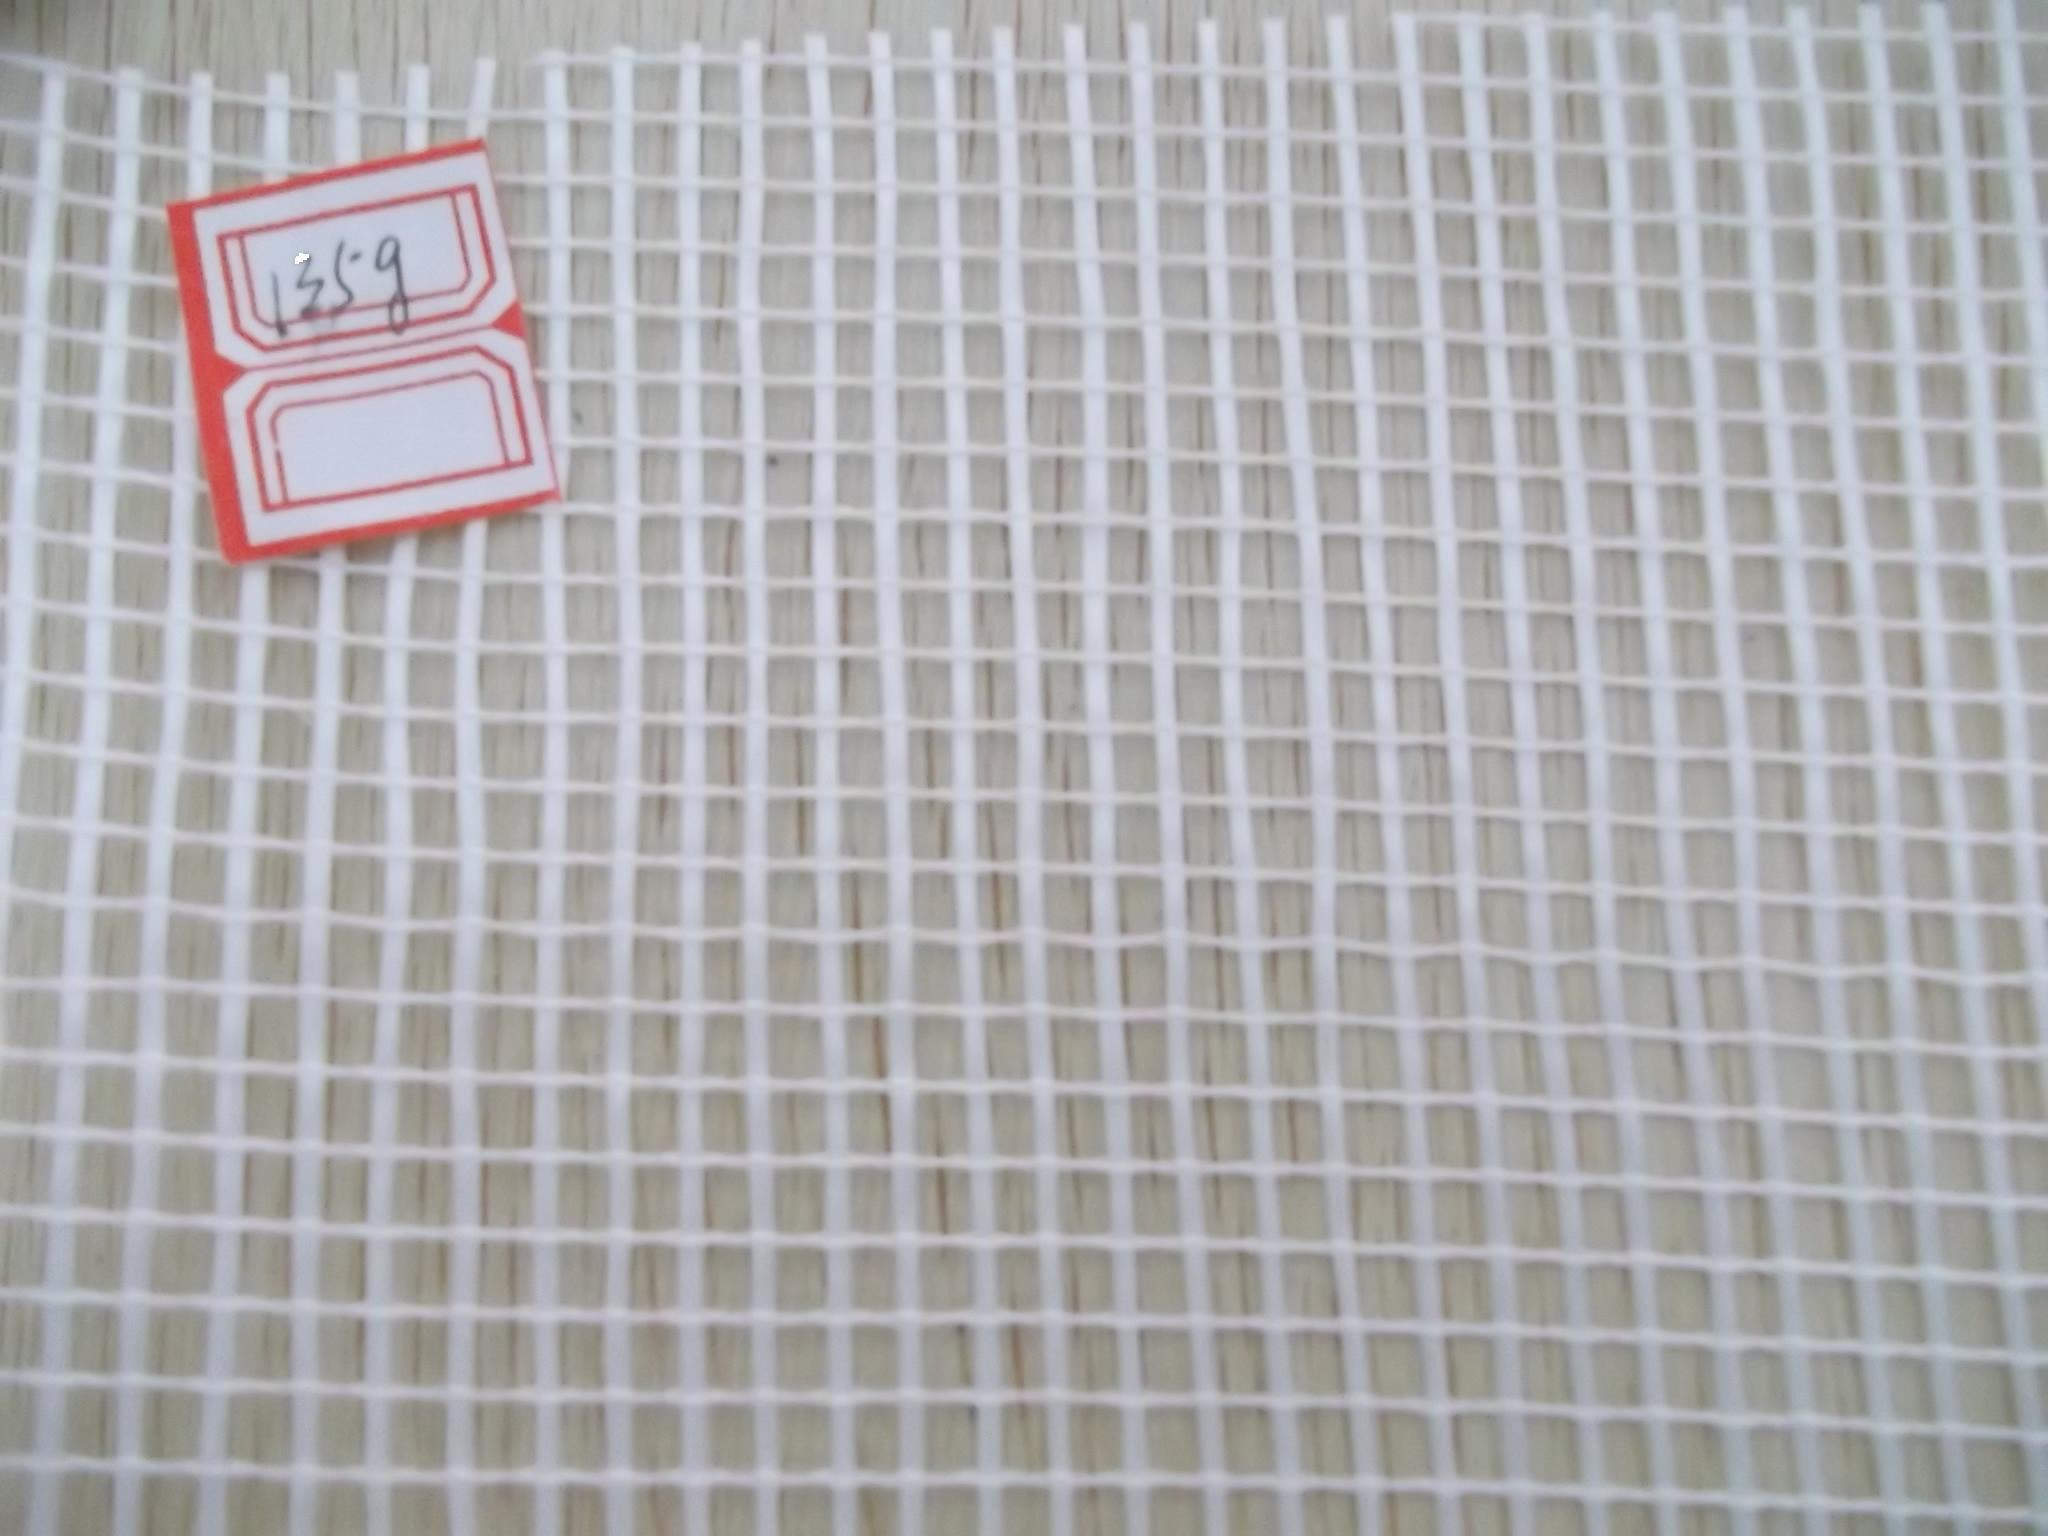 White Fiberglass Mesh : China fiberglass mesh g white photos pictures